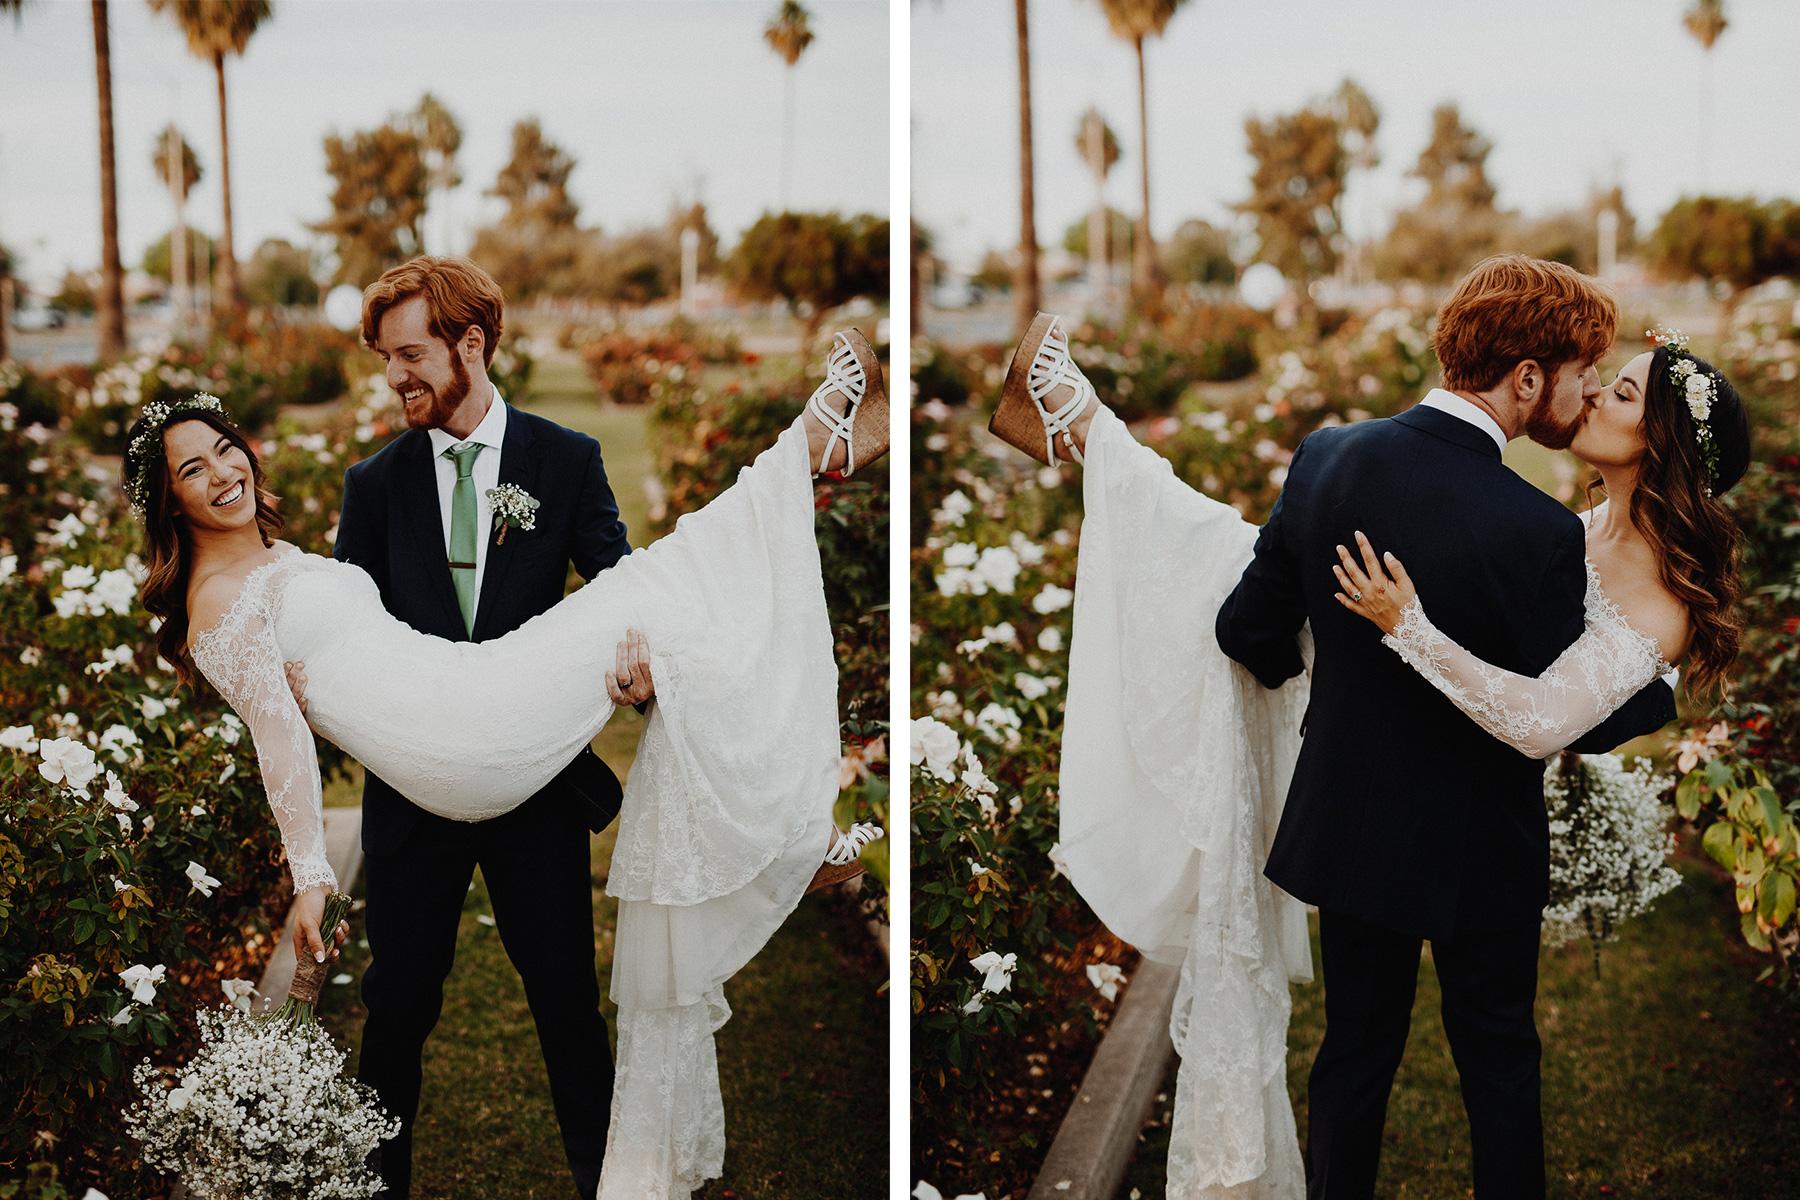 181104-Luxium-Weddings-Arizona-@matt__Le-Brandon-Kariana-Phoenix-Valley-Garden-Center-1111A.jpg